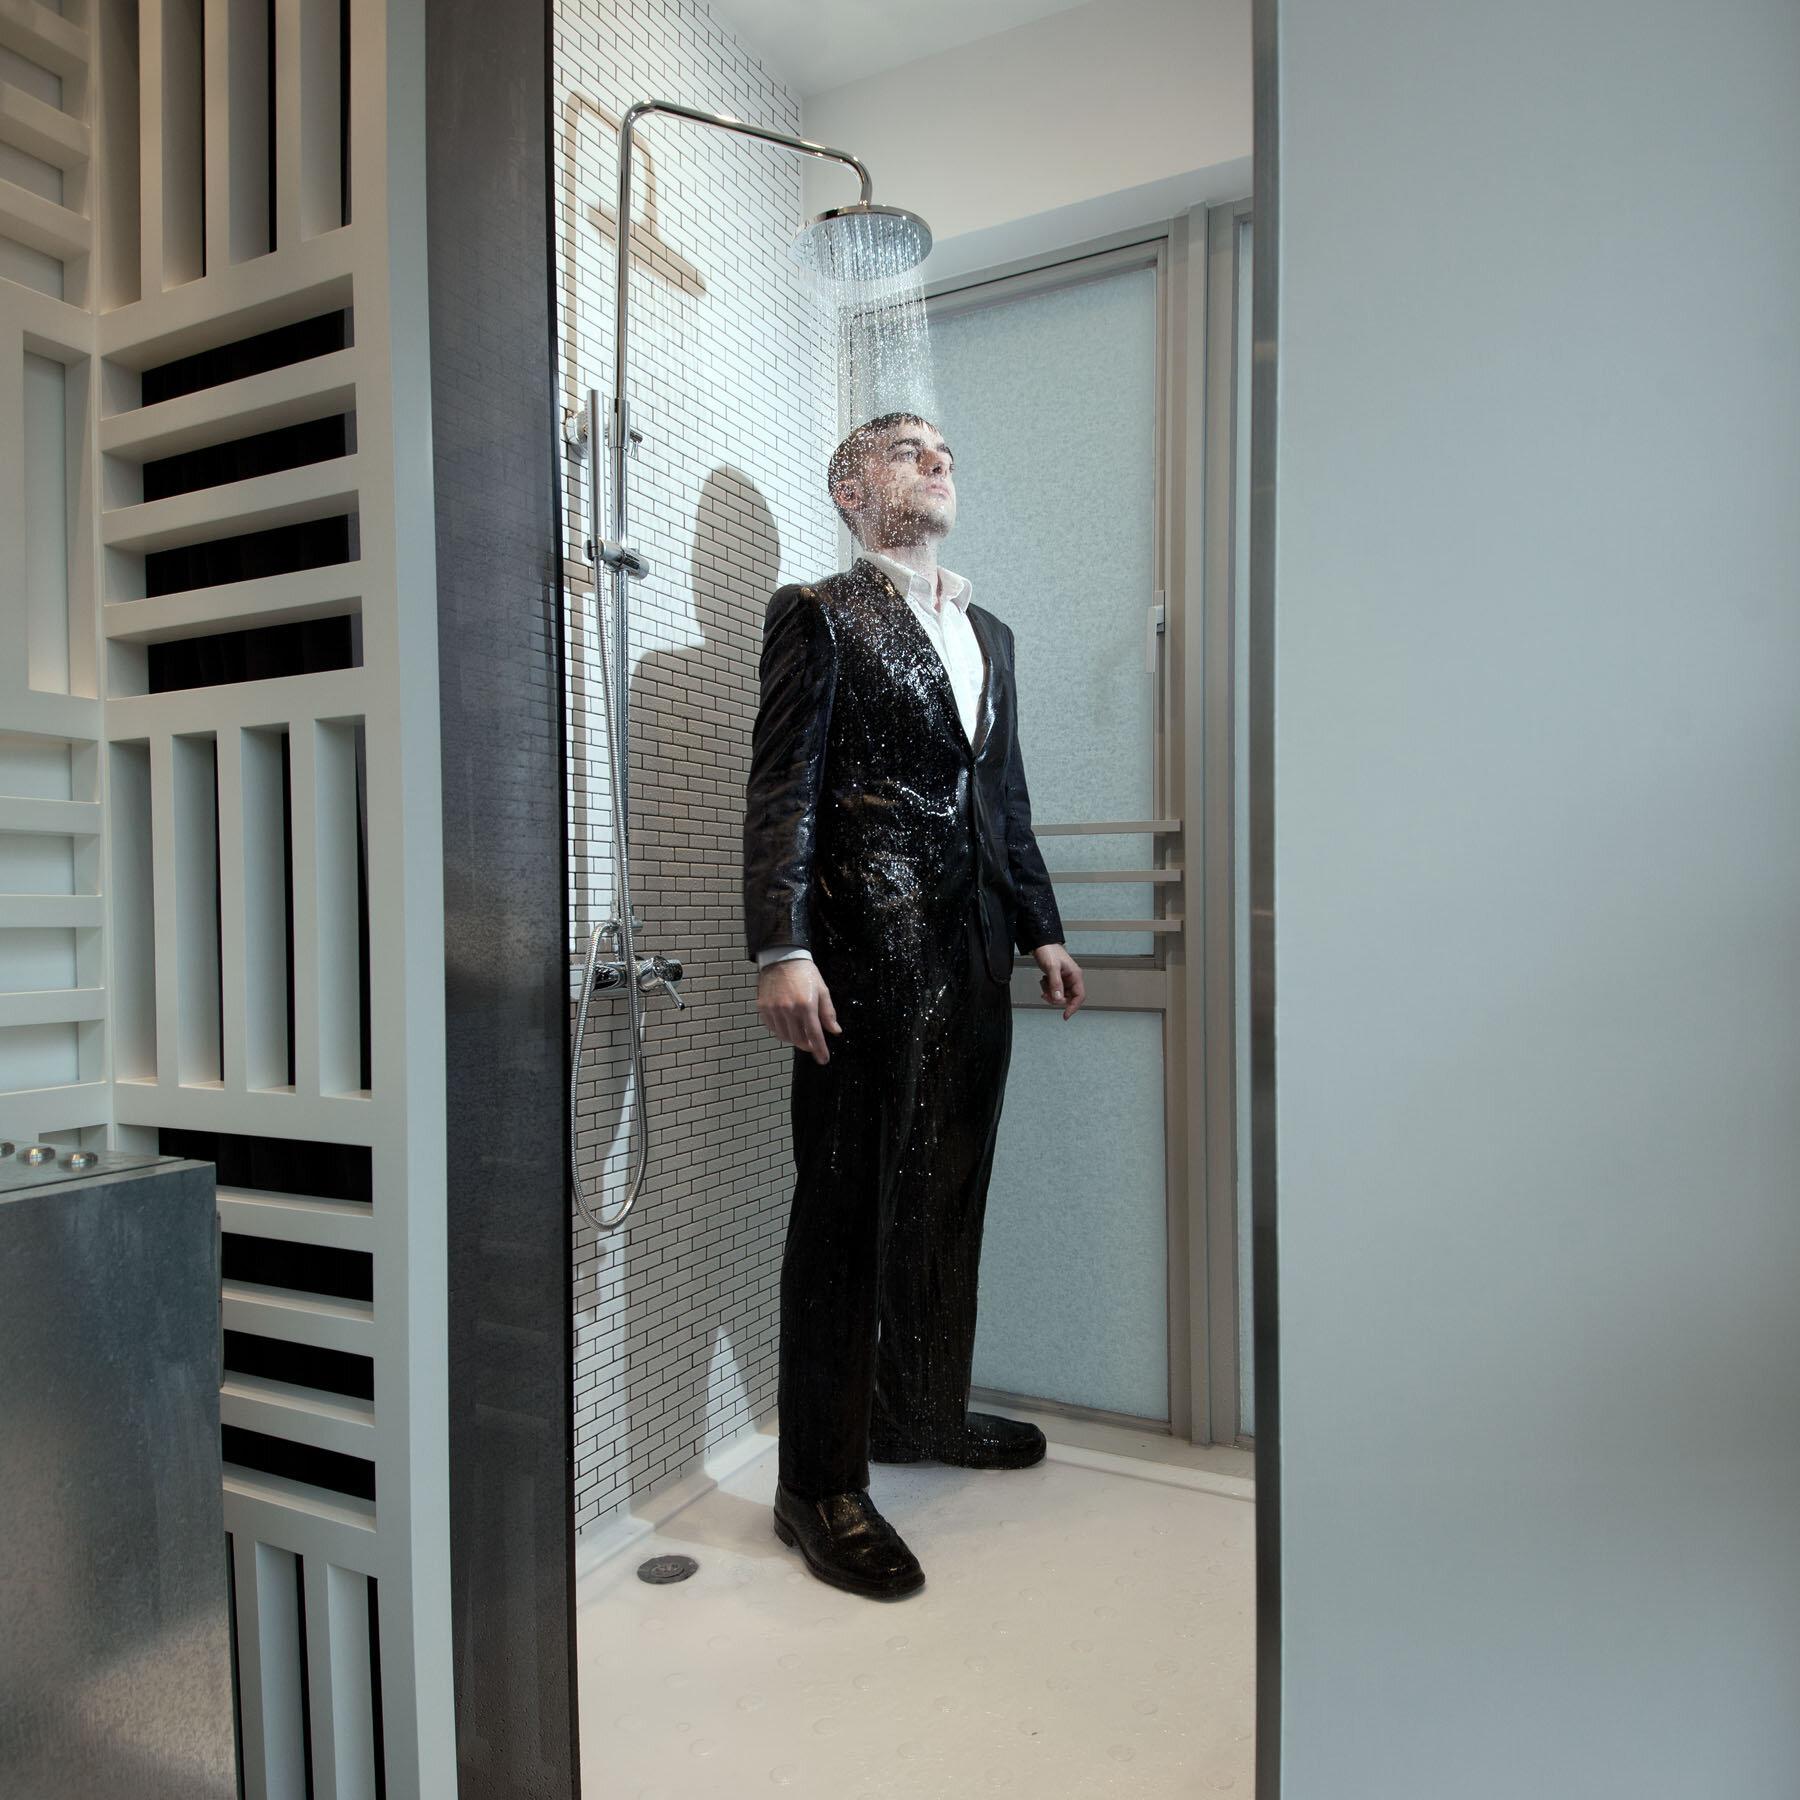 Ovolo shower COL.jpg